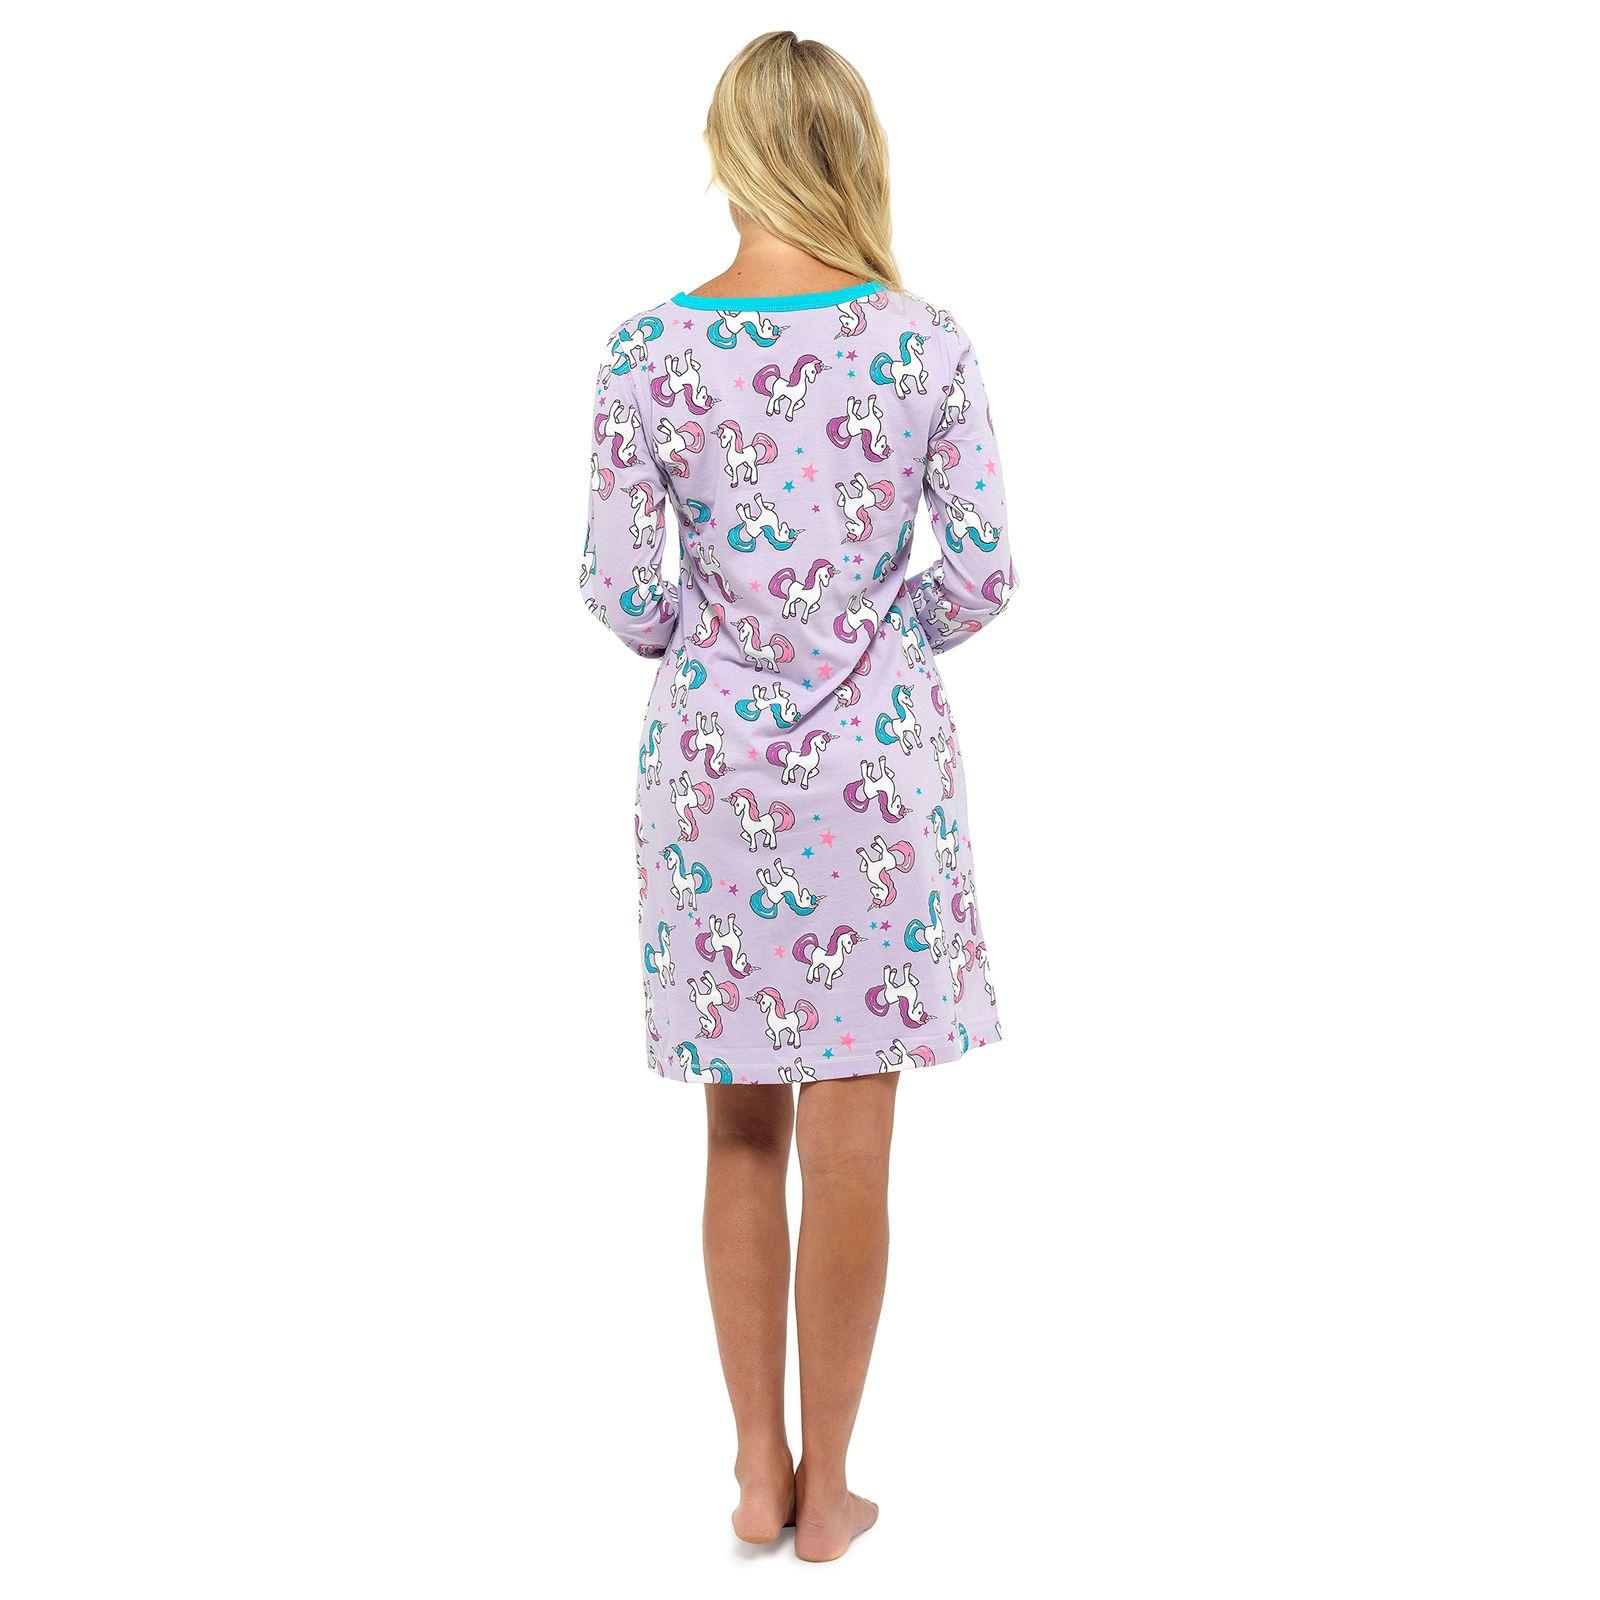 Womens Pug Unicorn Novelty Printed Long Sleeved Nighties UK Sizes 8-22